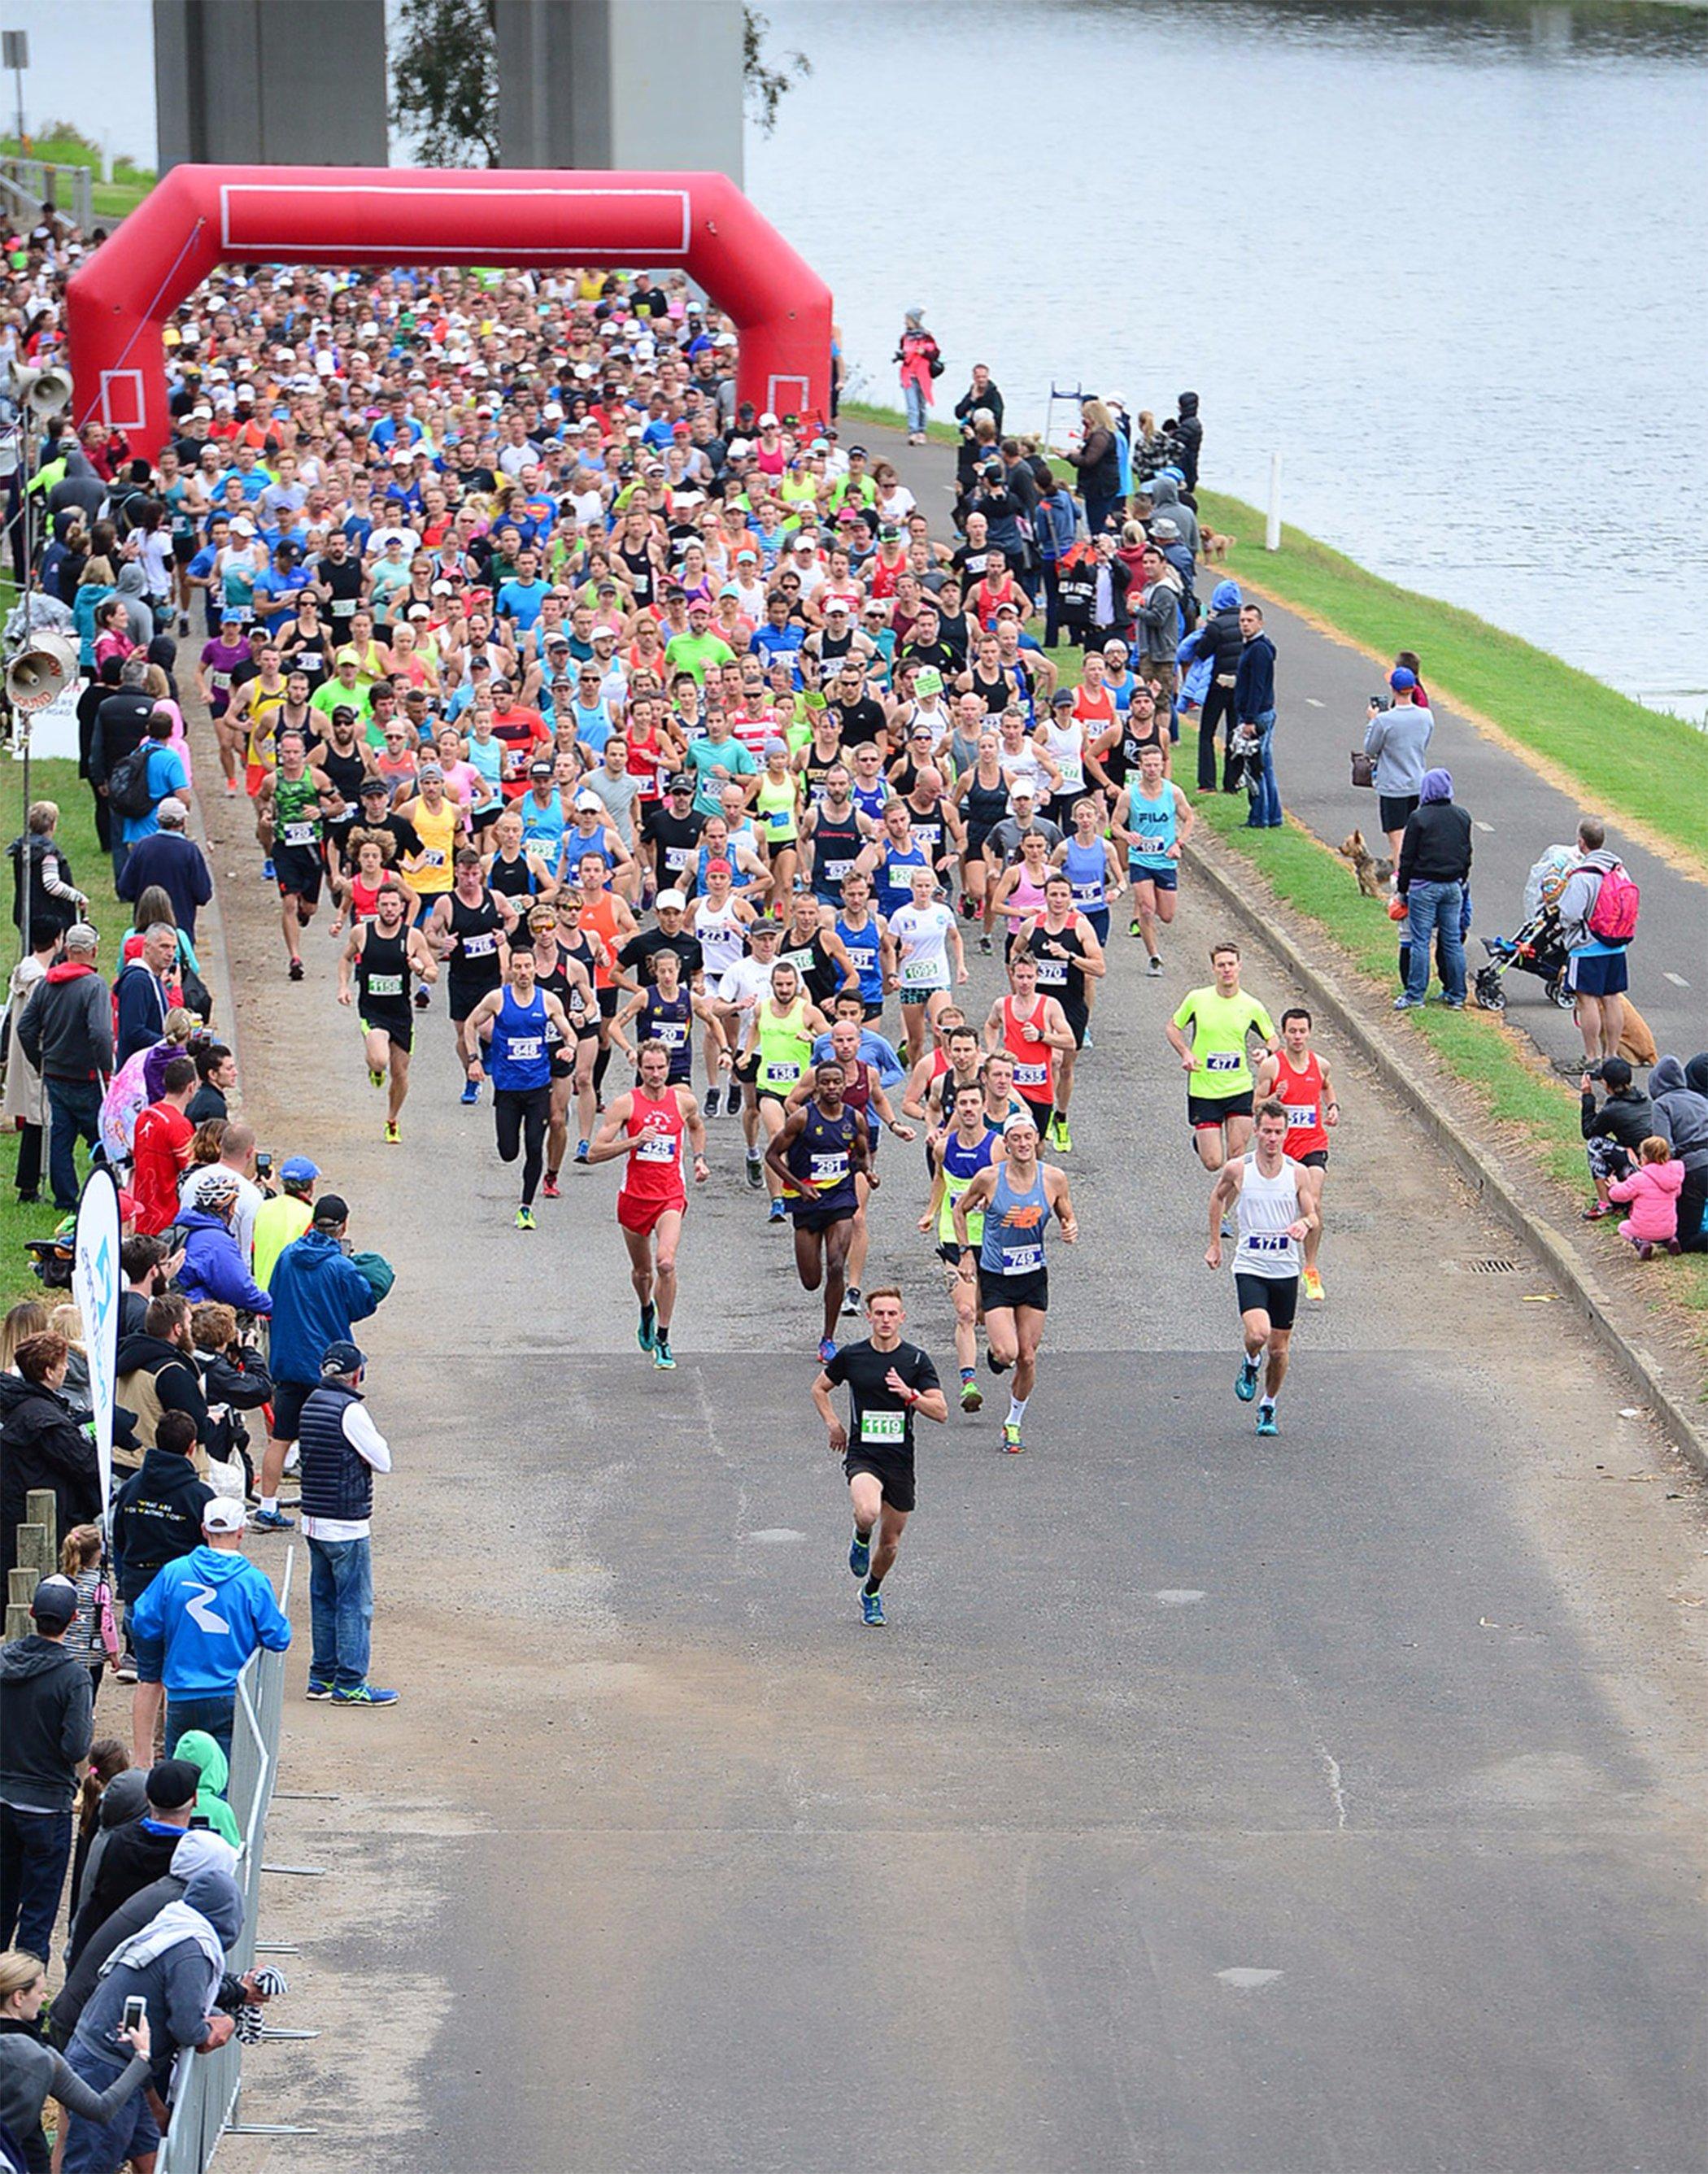 Geelong Cross Country Anglesea 8 Kilometre Footrace